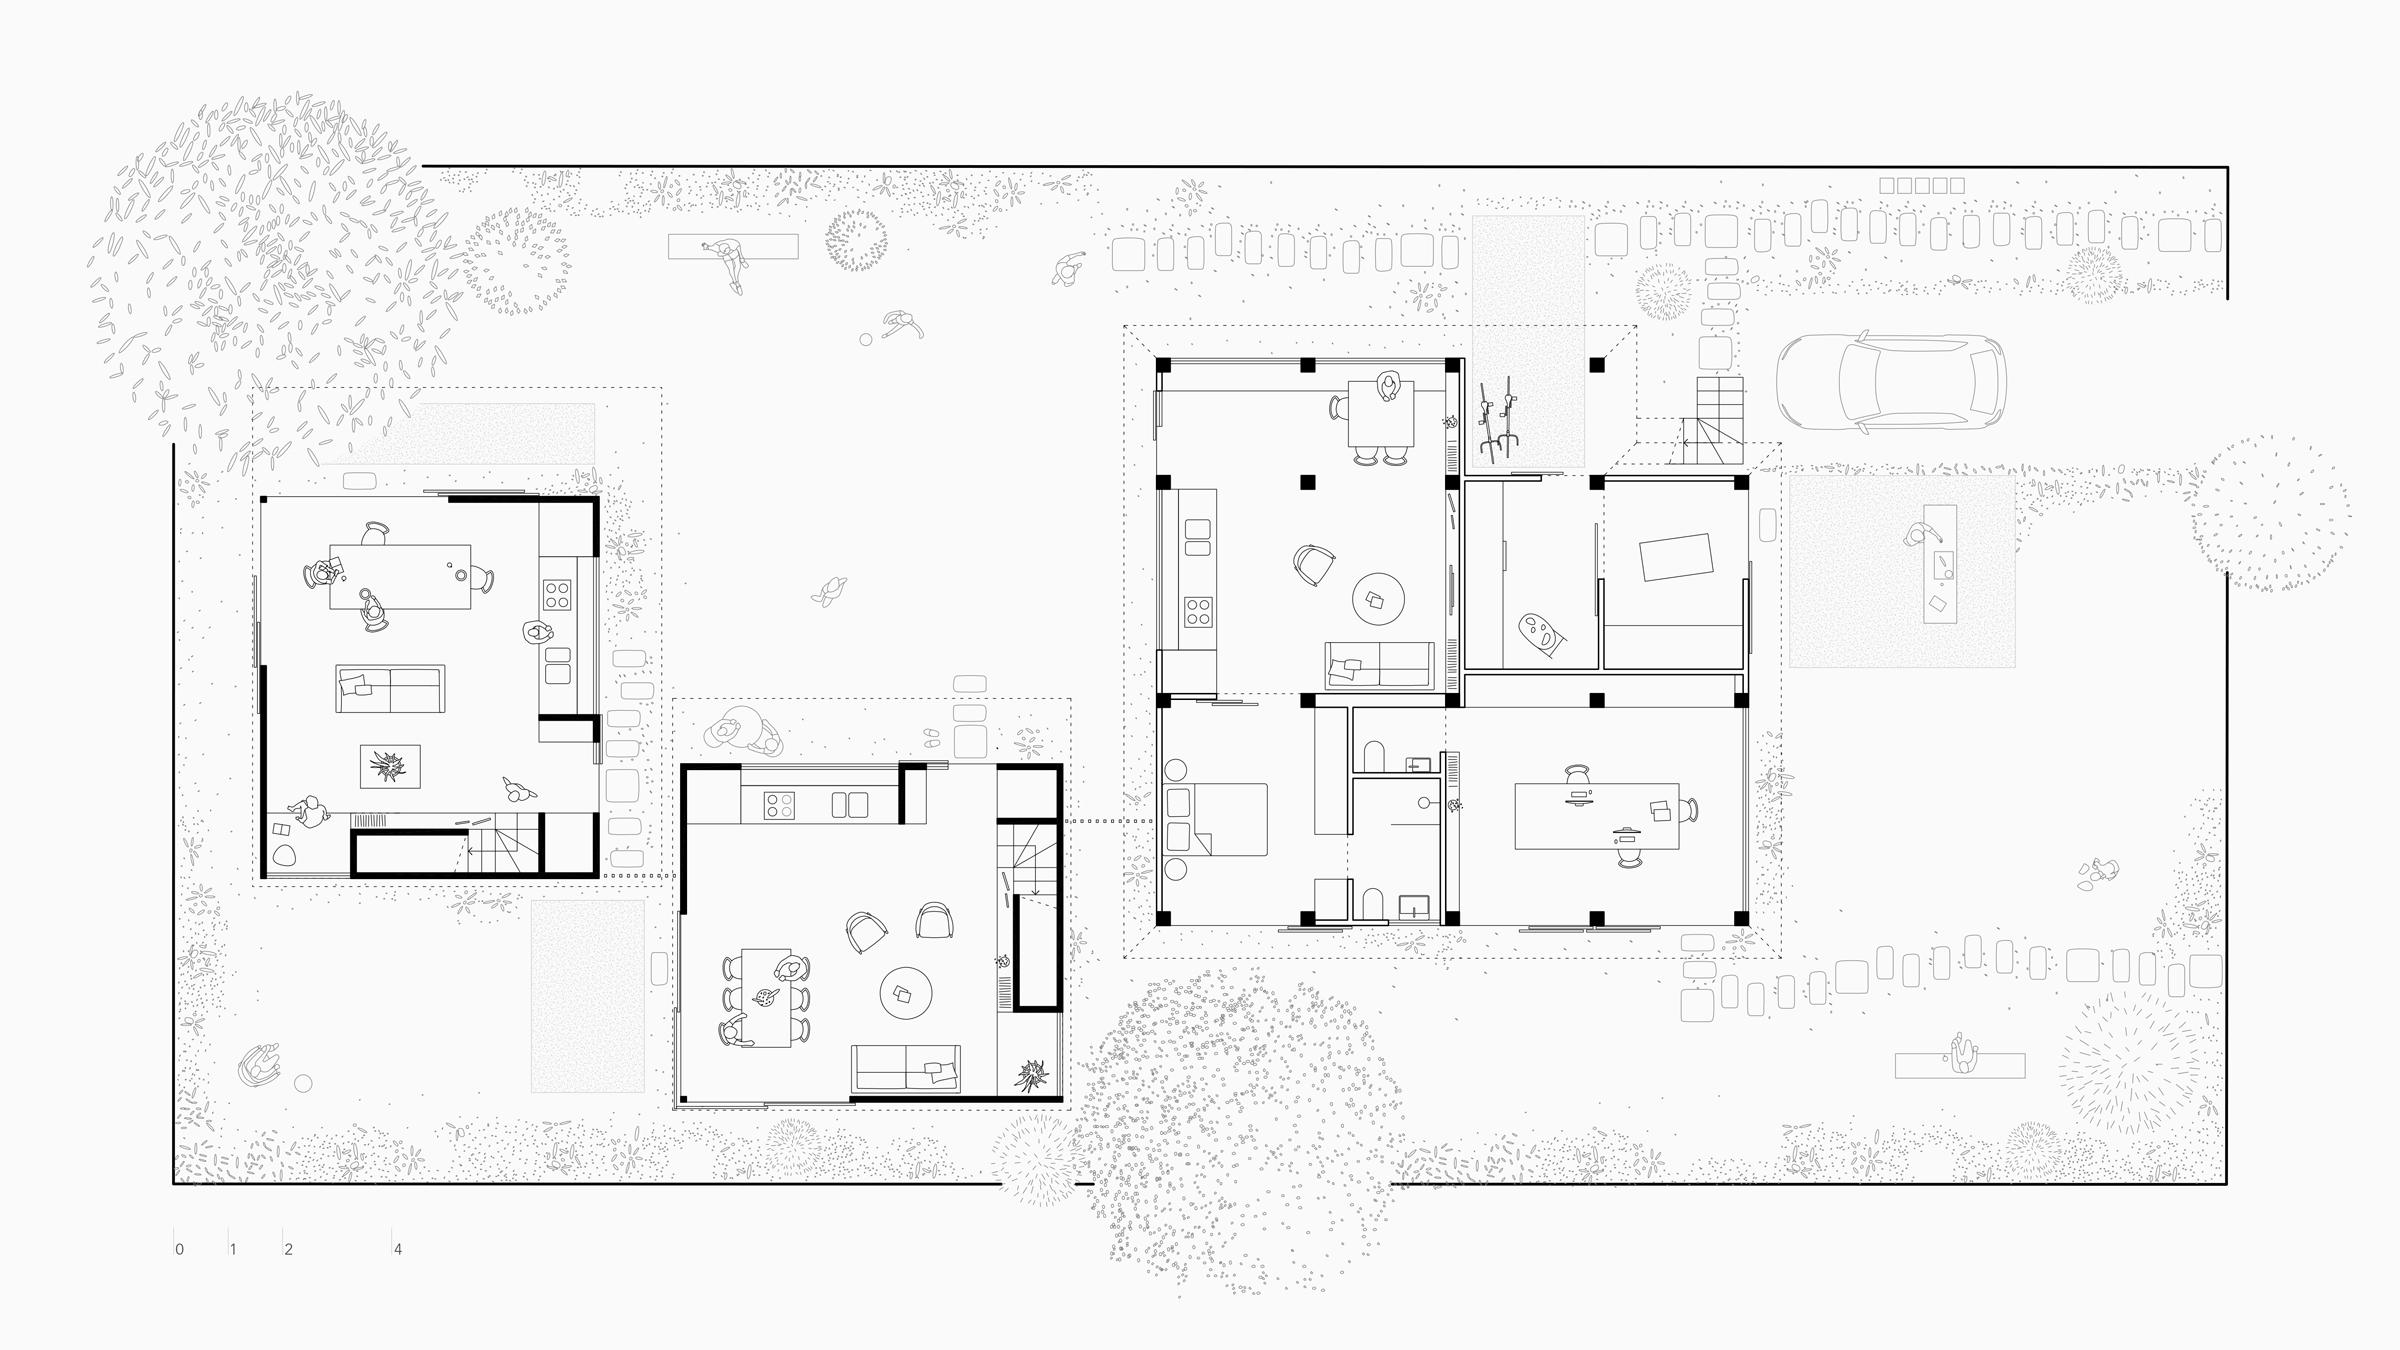 QUEENSLAND-RESIDENTIAL-ARCHITECT-TRIAS-STUDIO-QUEENSLAND-HOUSE-D02